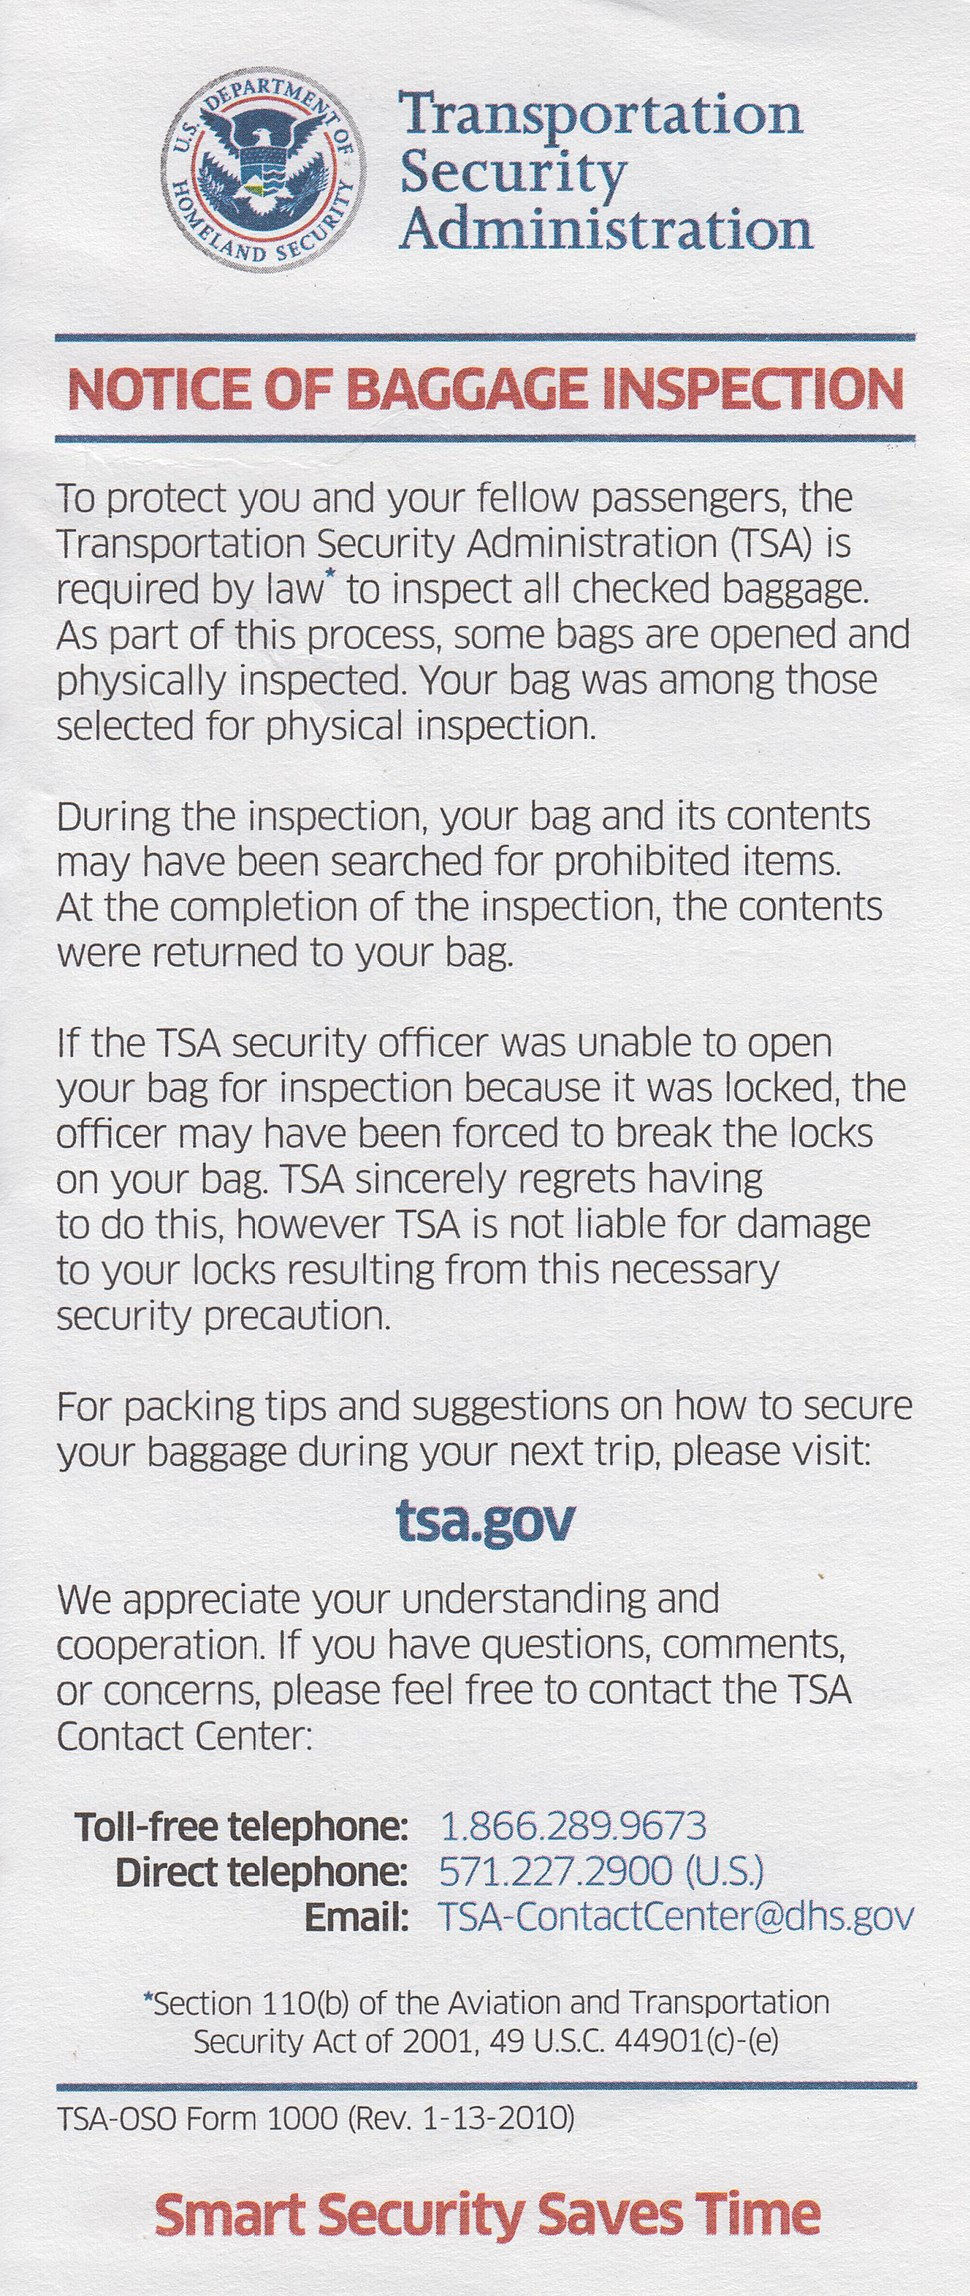 Tsa notice of baggage inspection